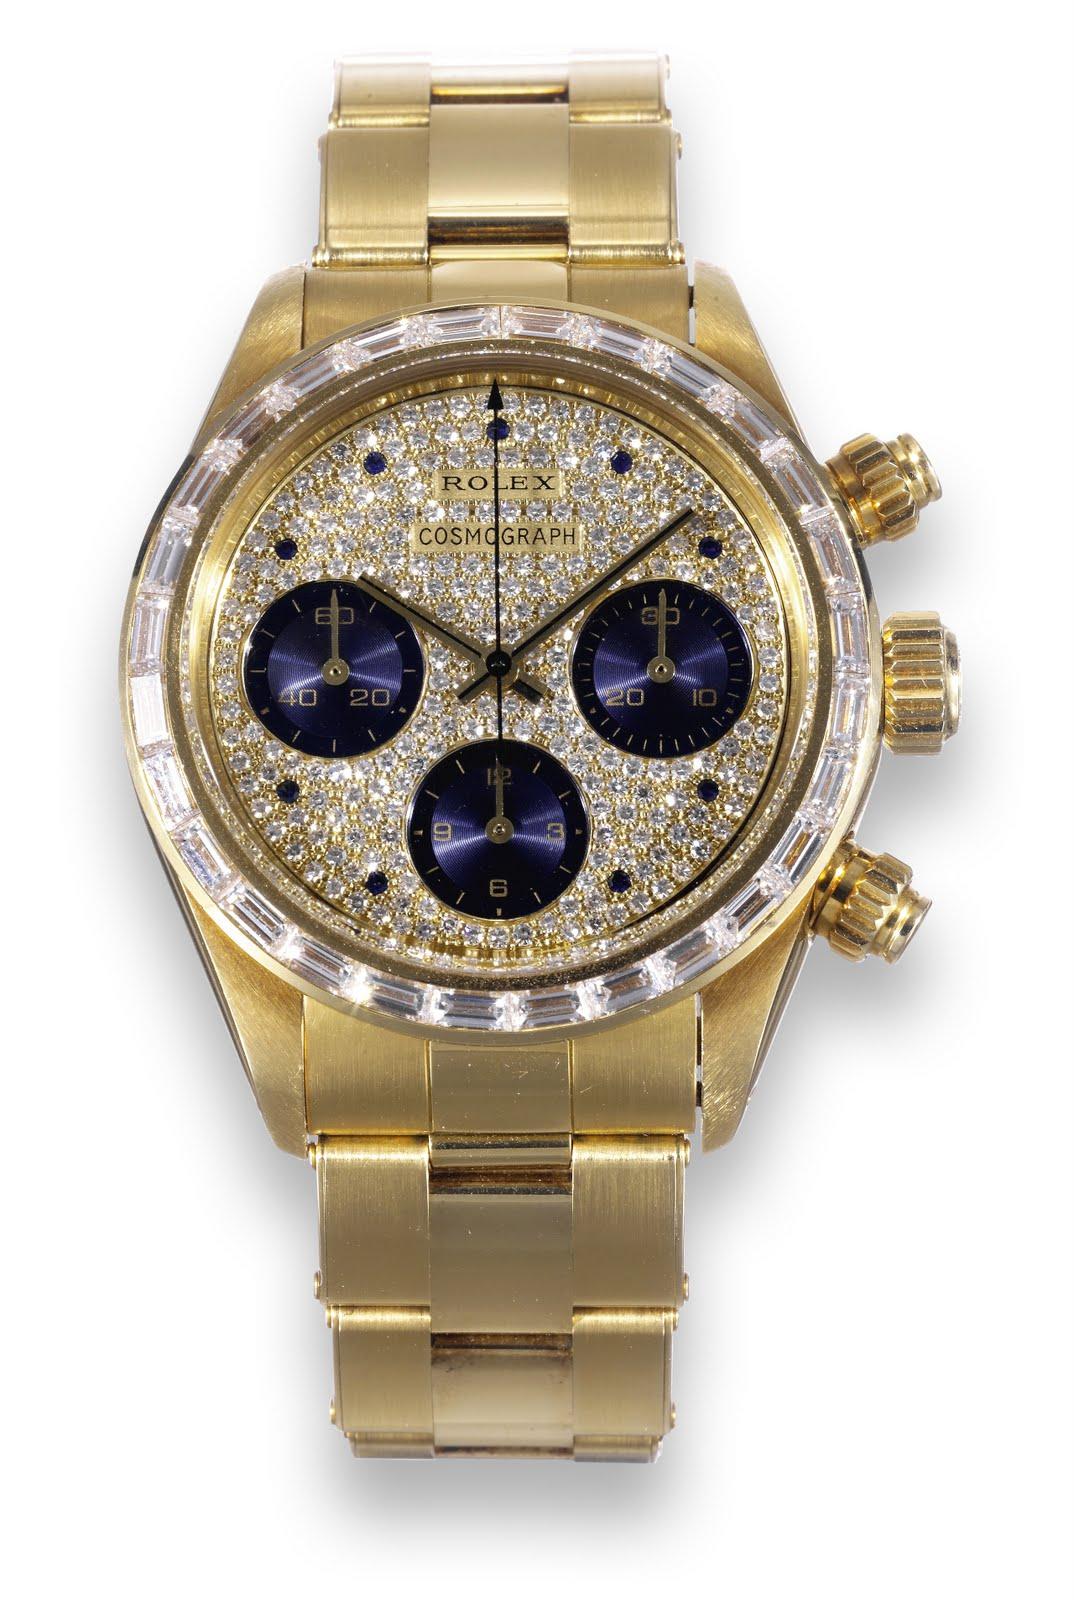 Wrist watch price in oman - Tom Bolt On Tv W Rolex Sultan Oman Daytona